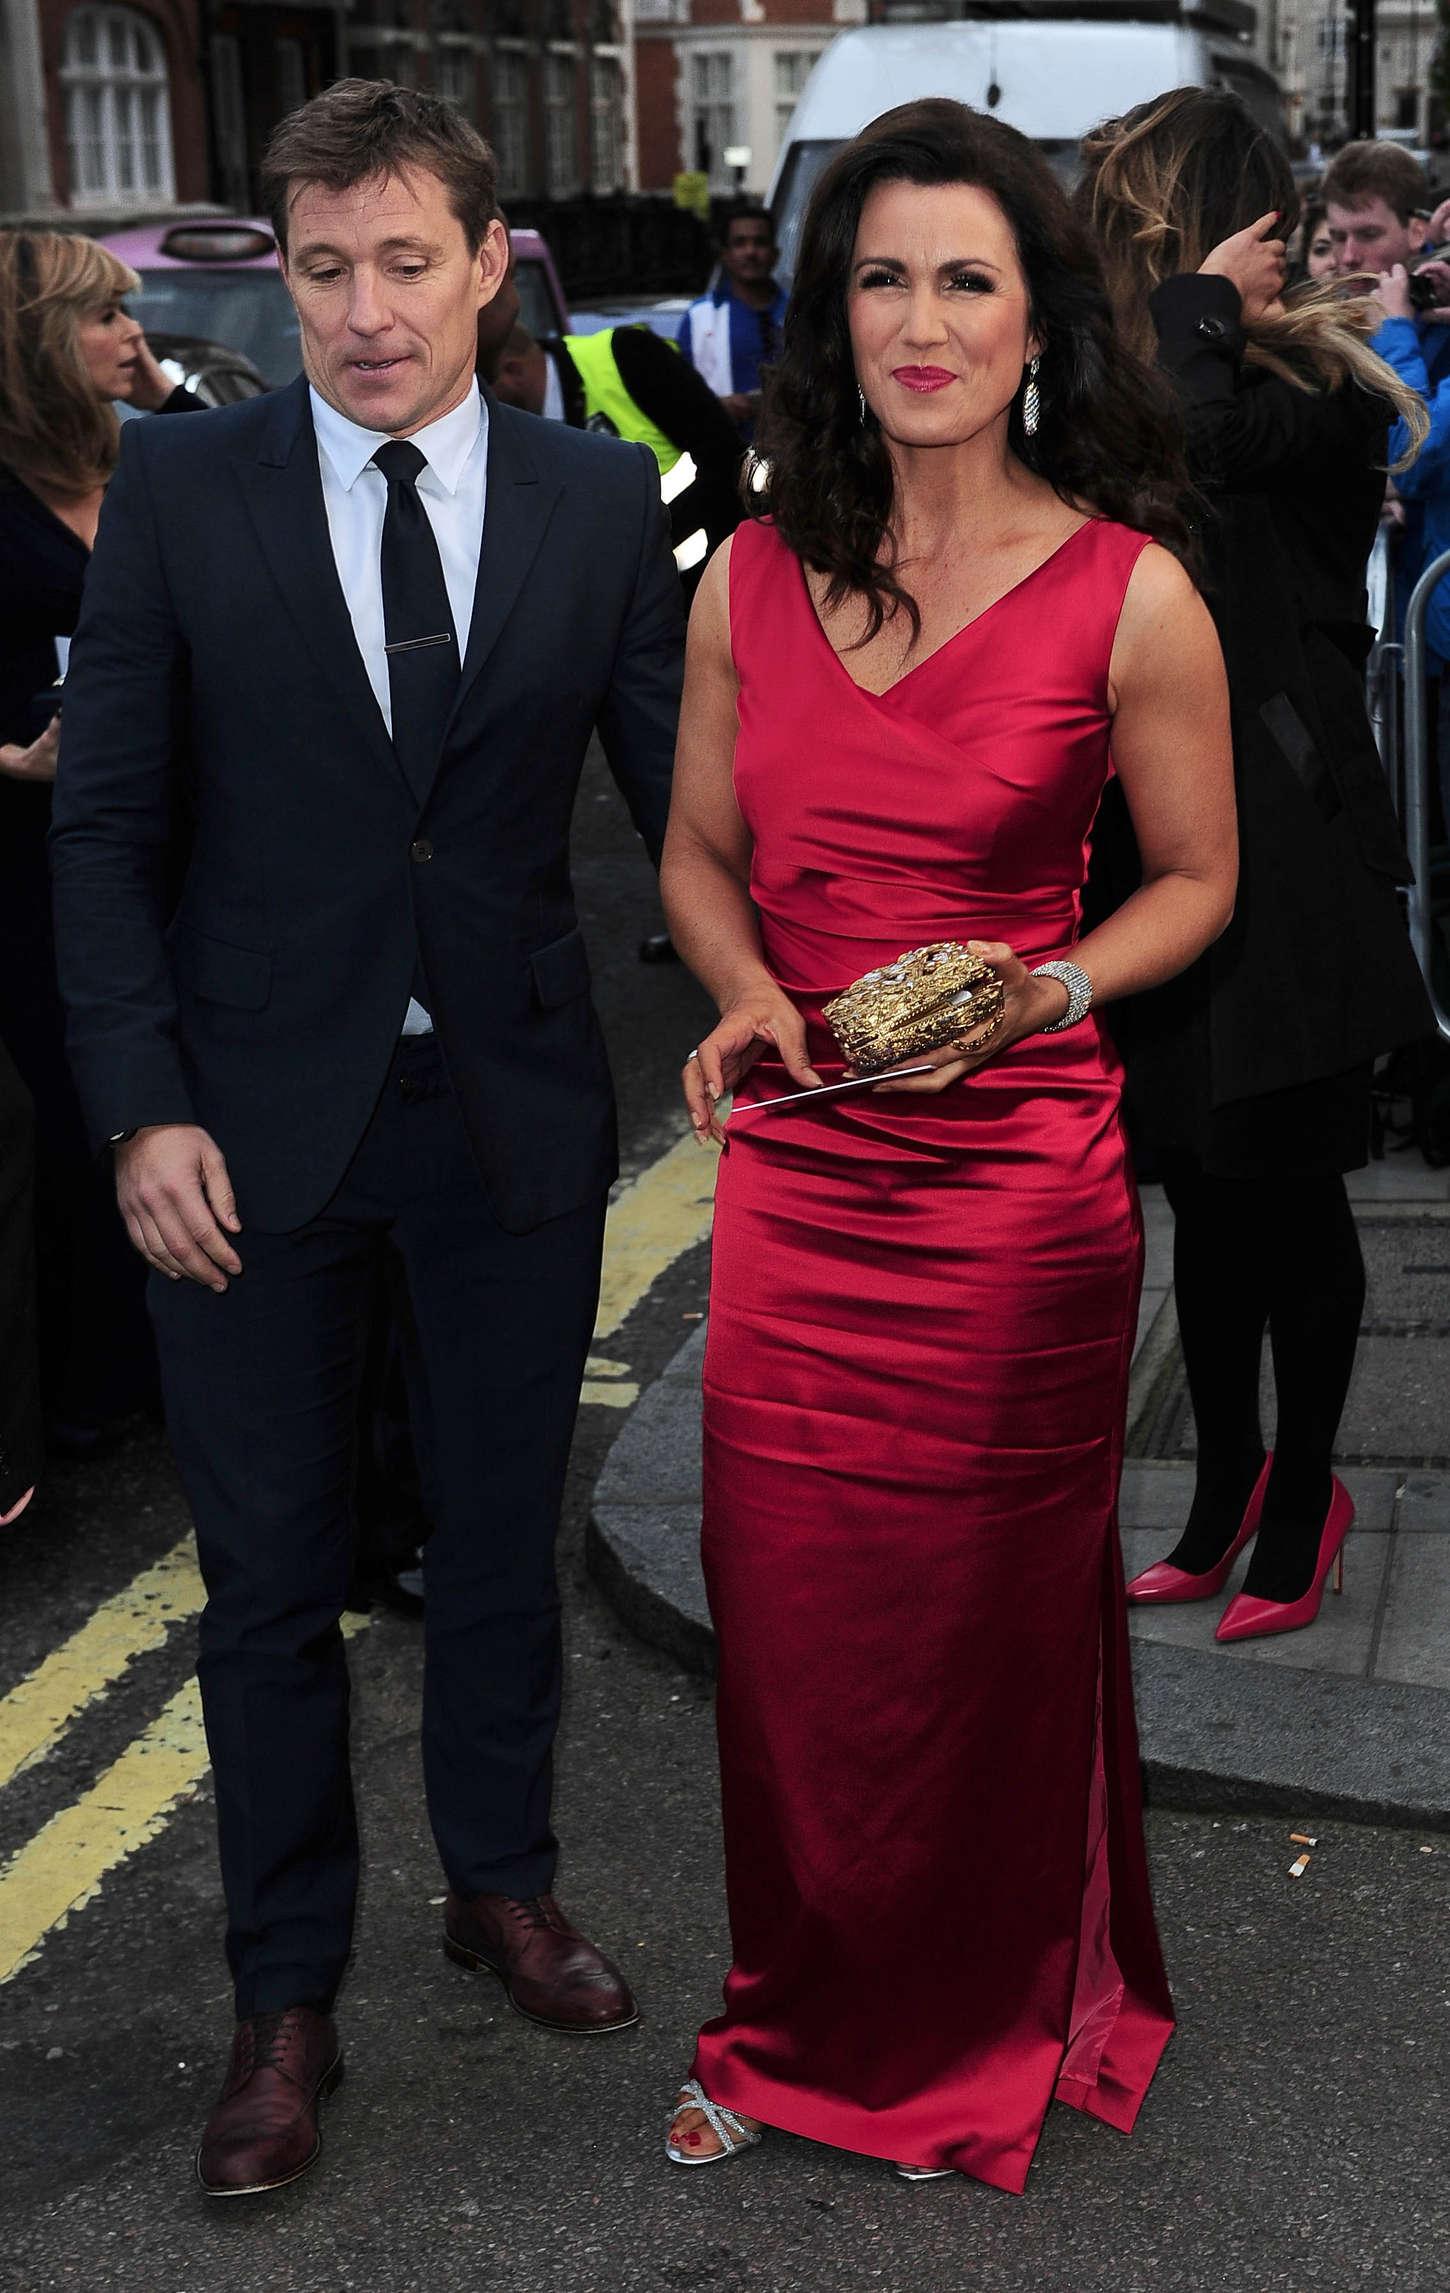 Susanna Reid Pride of Britain Awards in London